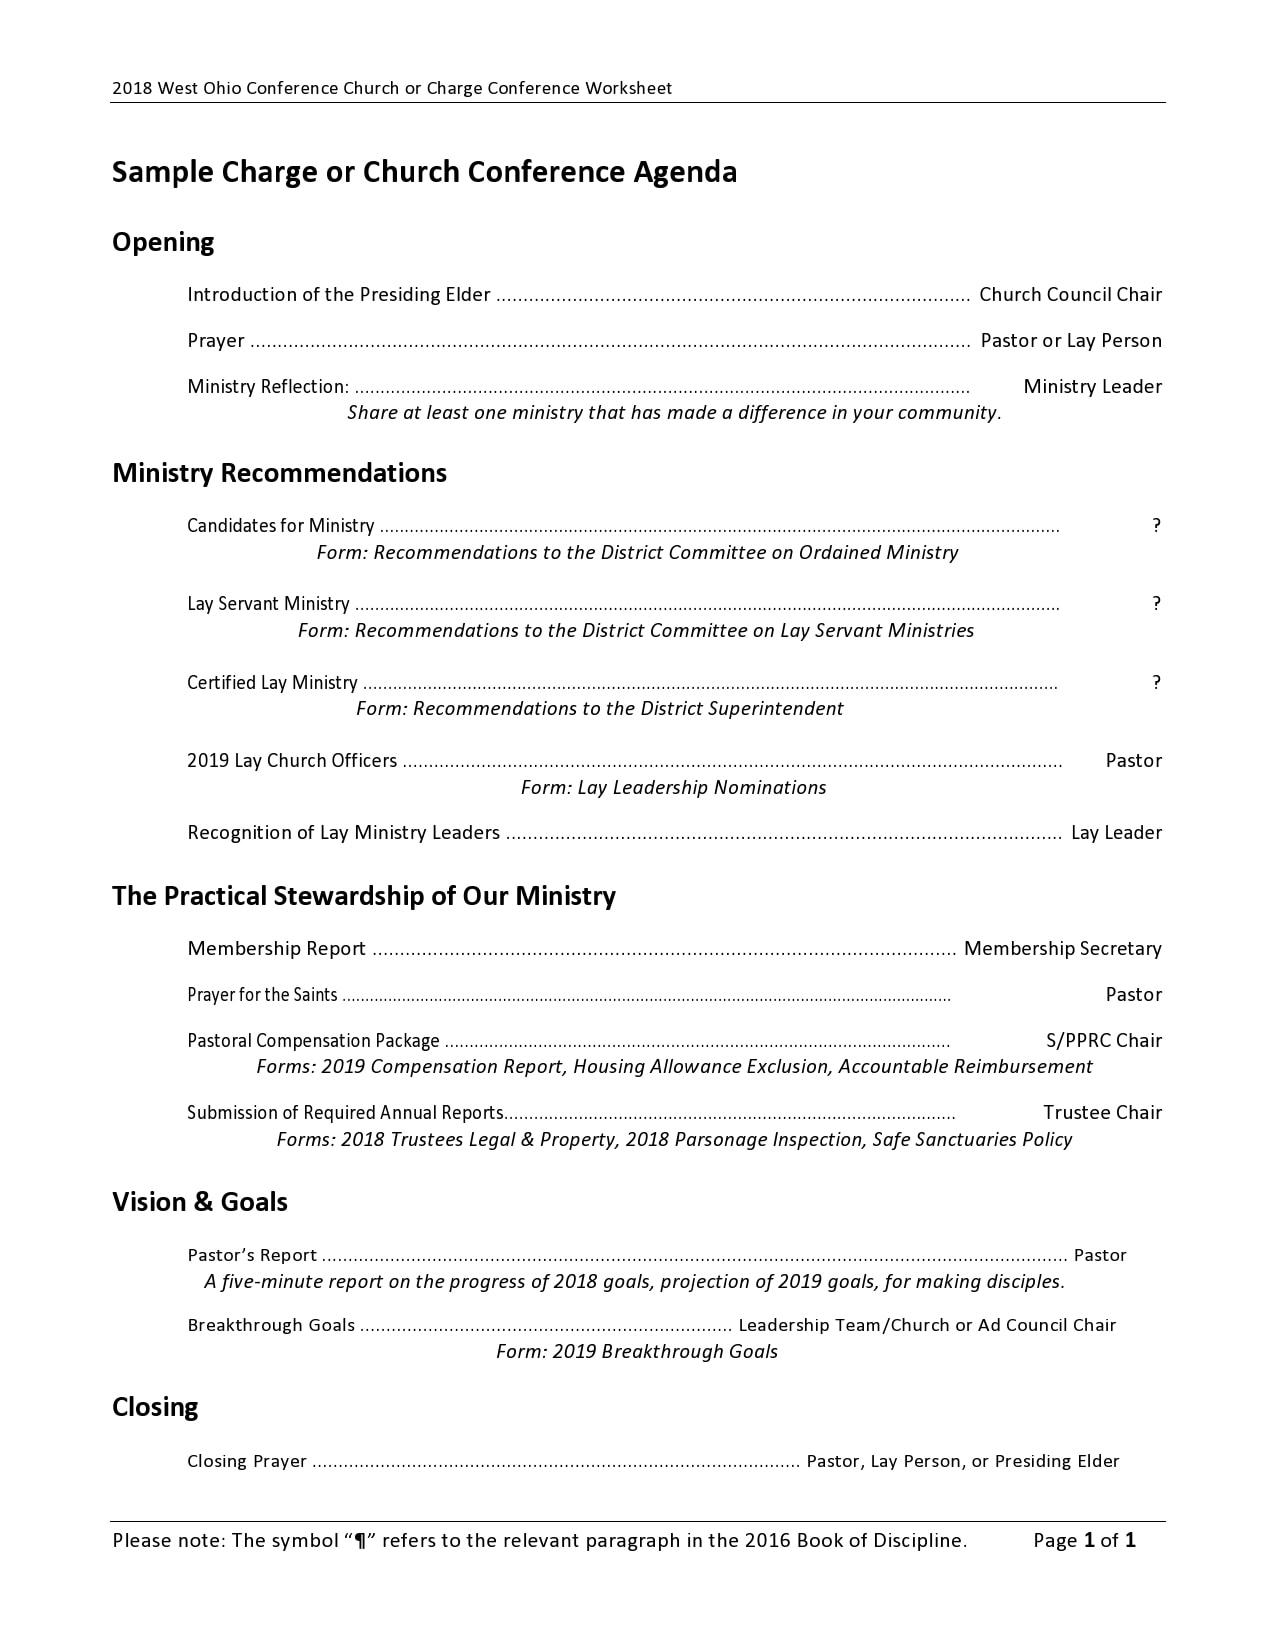 conference agenda template 12